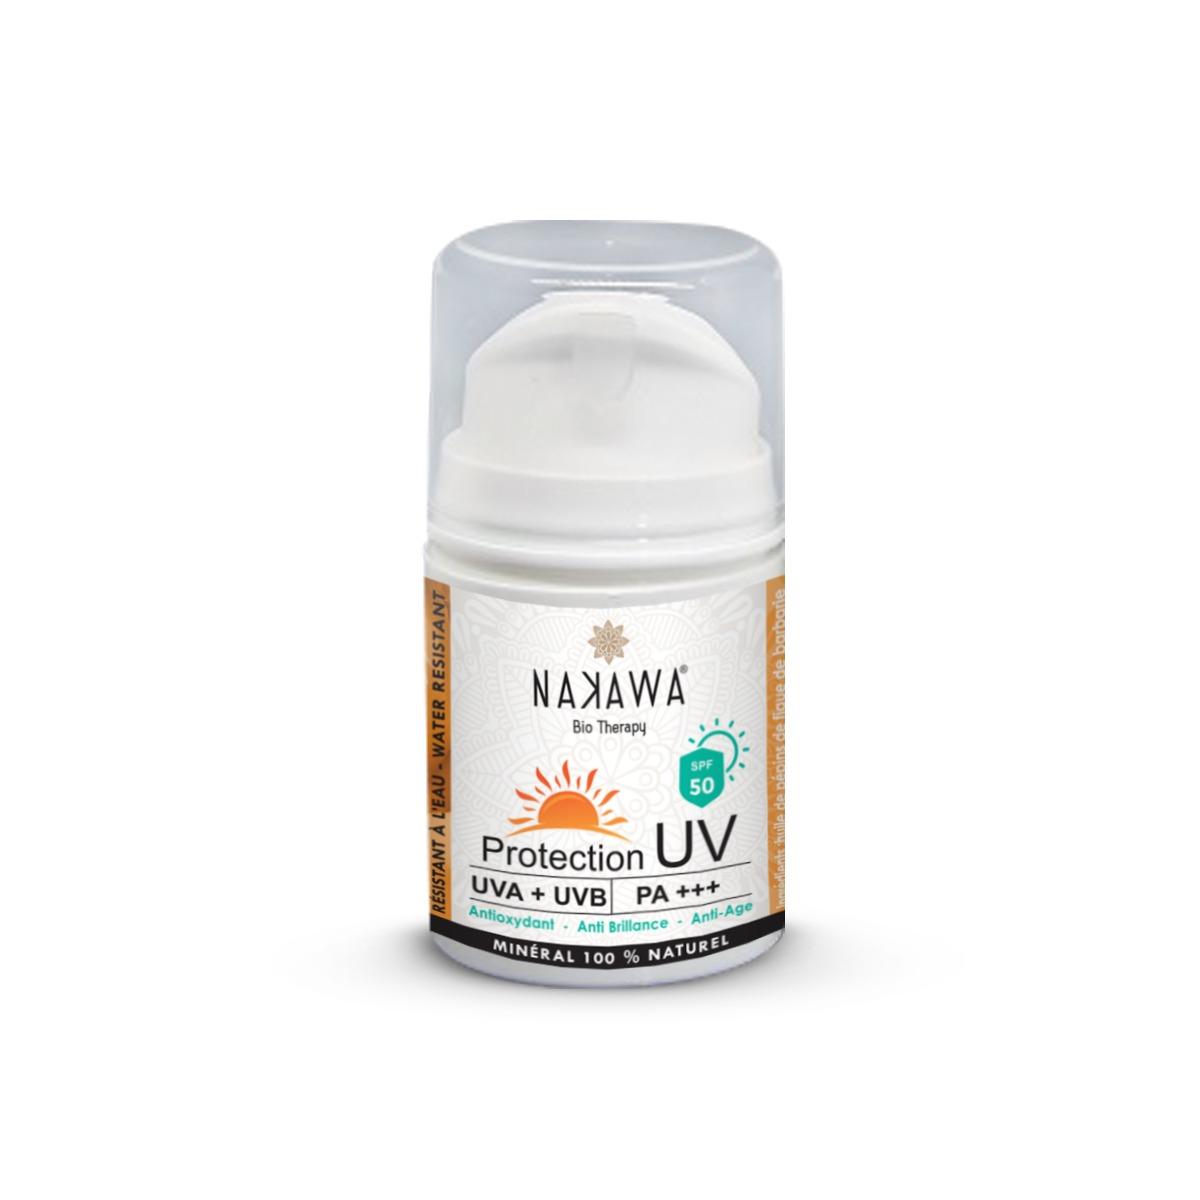 Daily Cream - Ecran Protection UV SPF 50 - NAKAWA BIO THERAPY